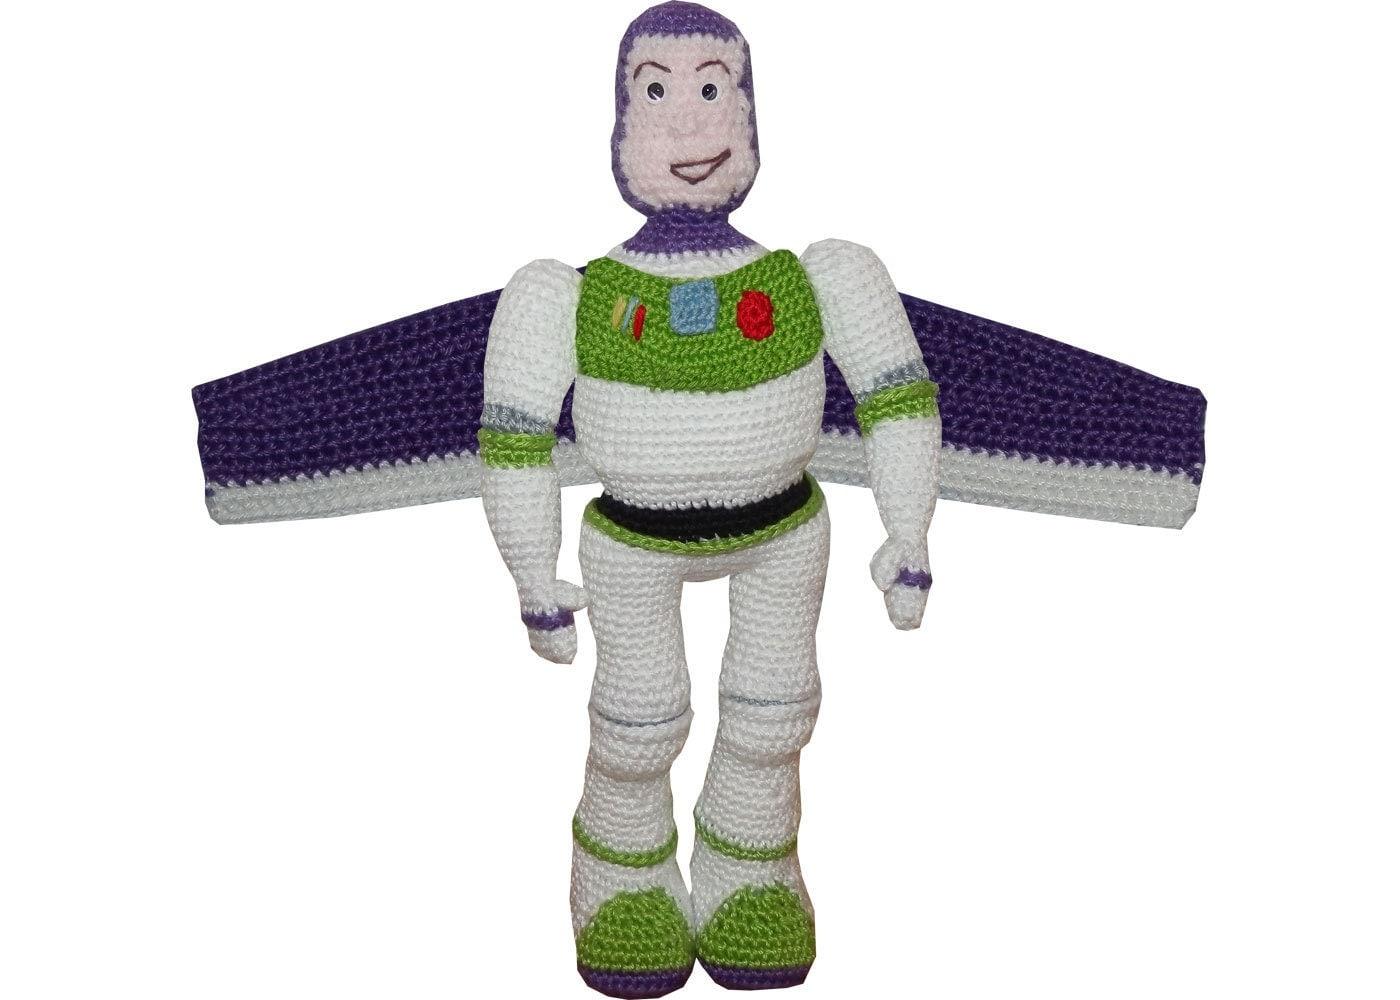 Toys Story Amigurumi : Amigurumi Crochet Pattern: Buzz Lightyear by anumi on Etsy